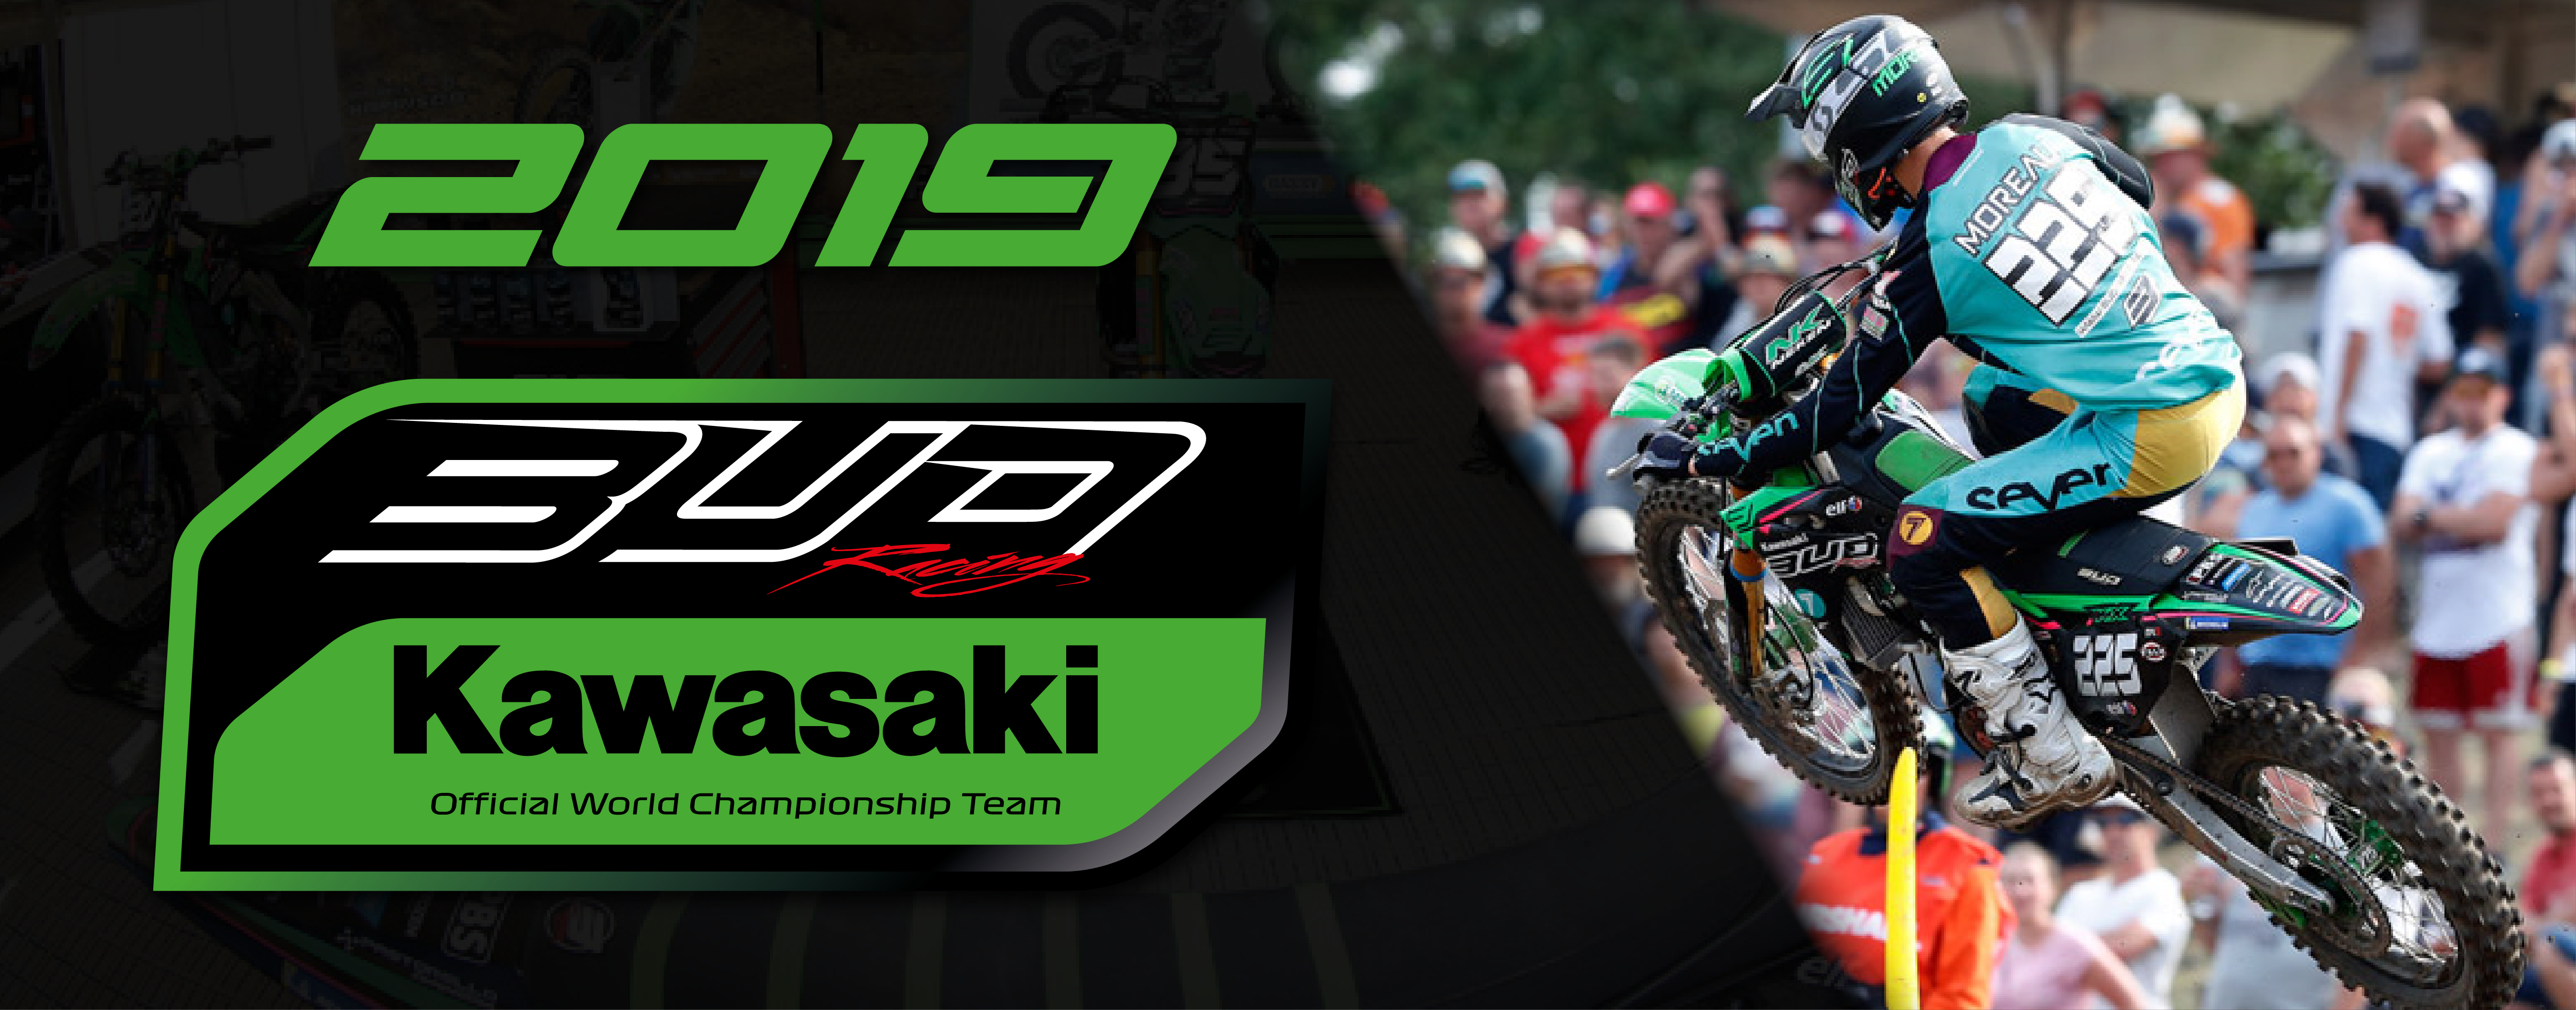 kit déco kawasaki team bud racing 2019 eight racing factory stickers graphics décals